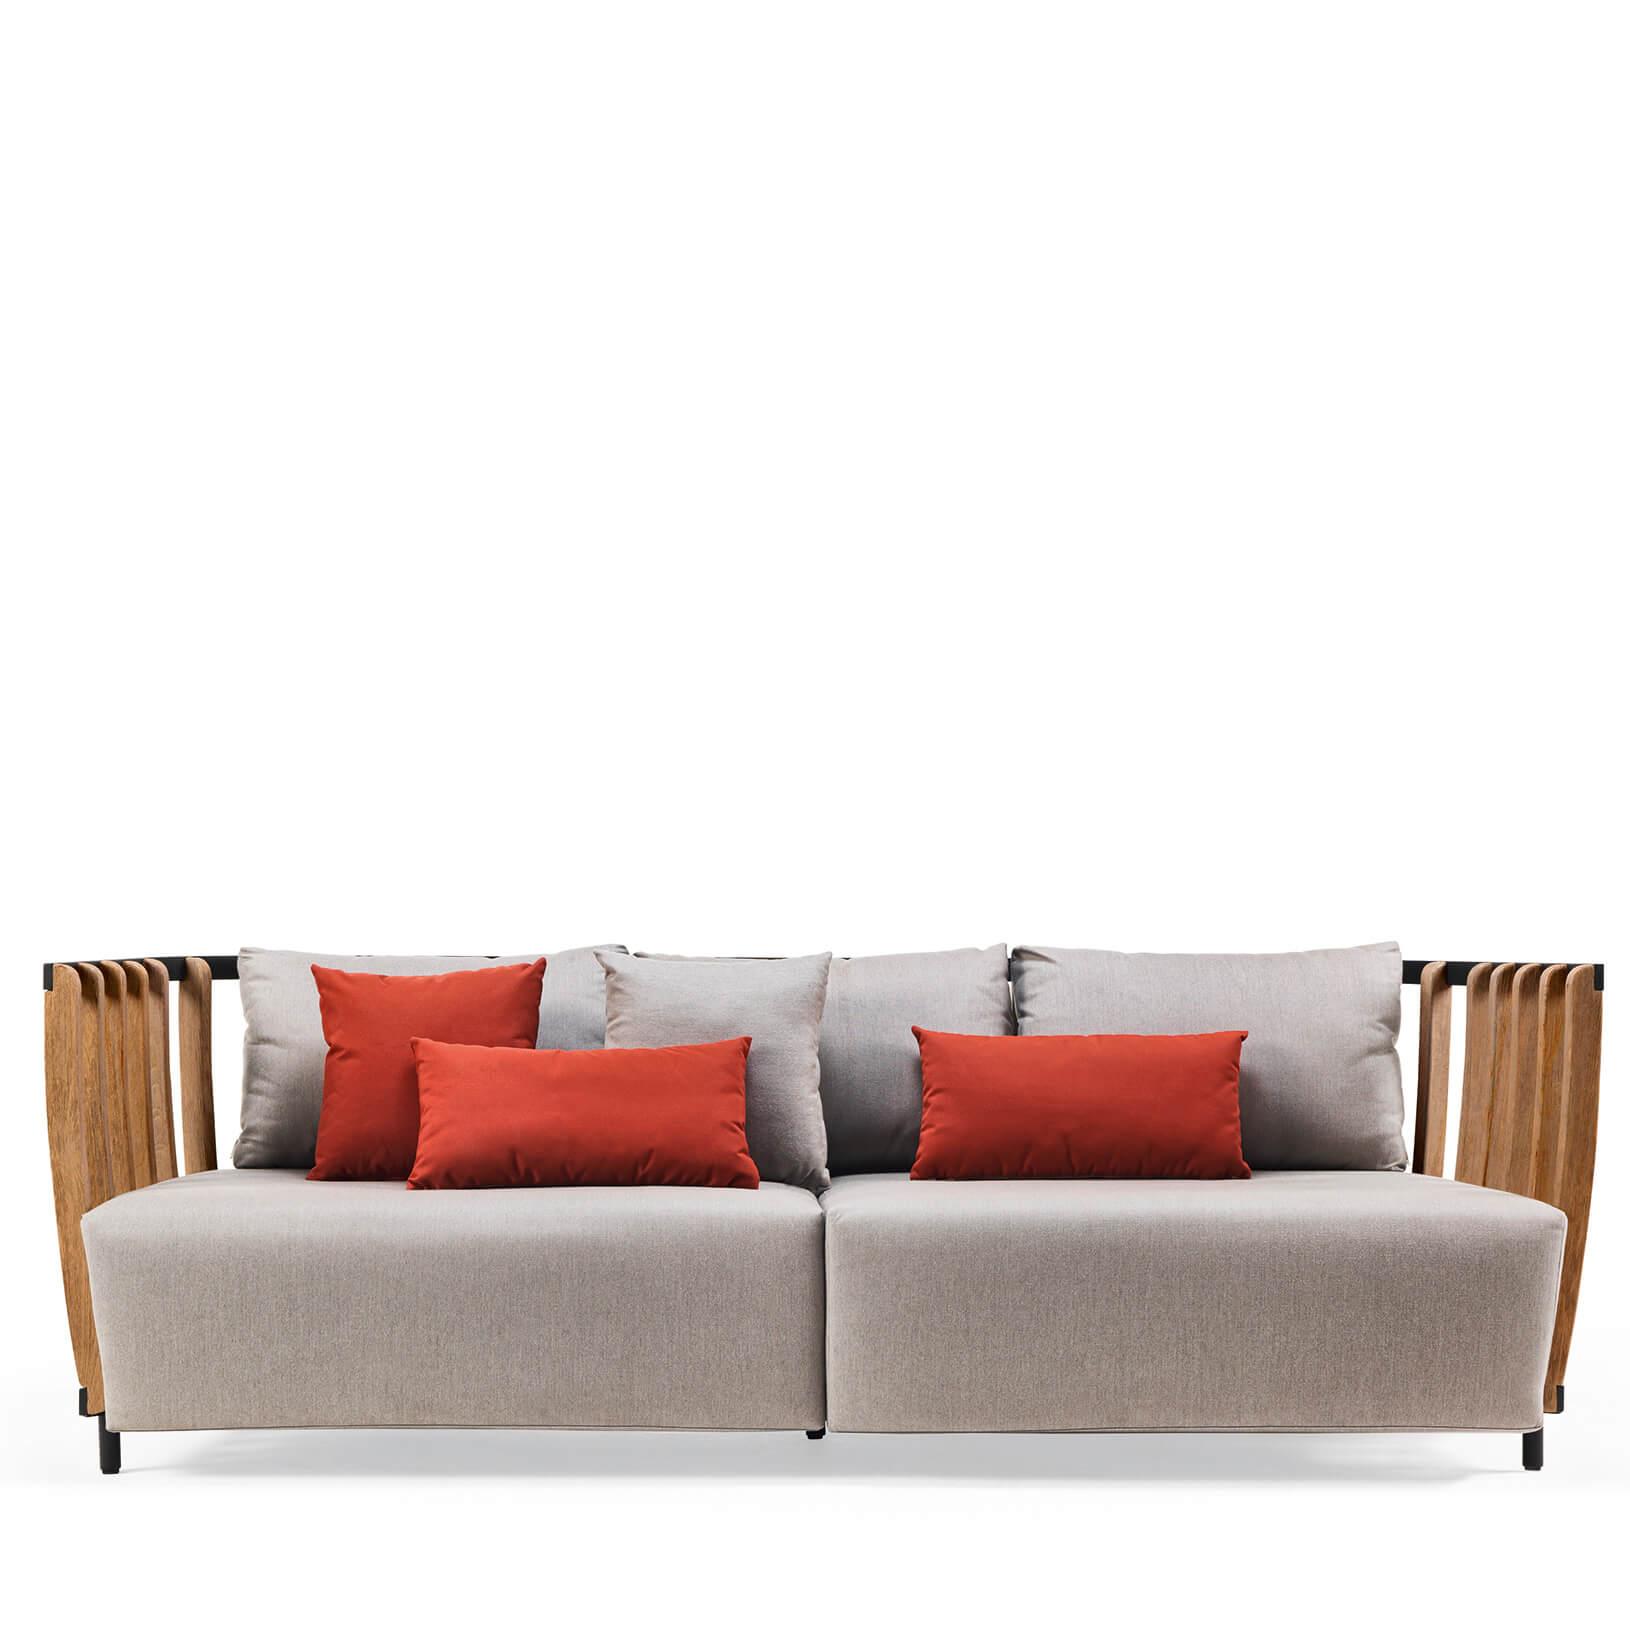 Голям градински диван, колекция Swing